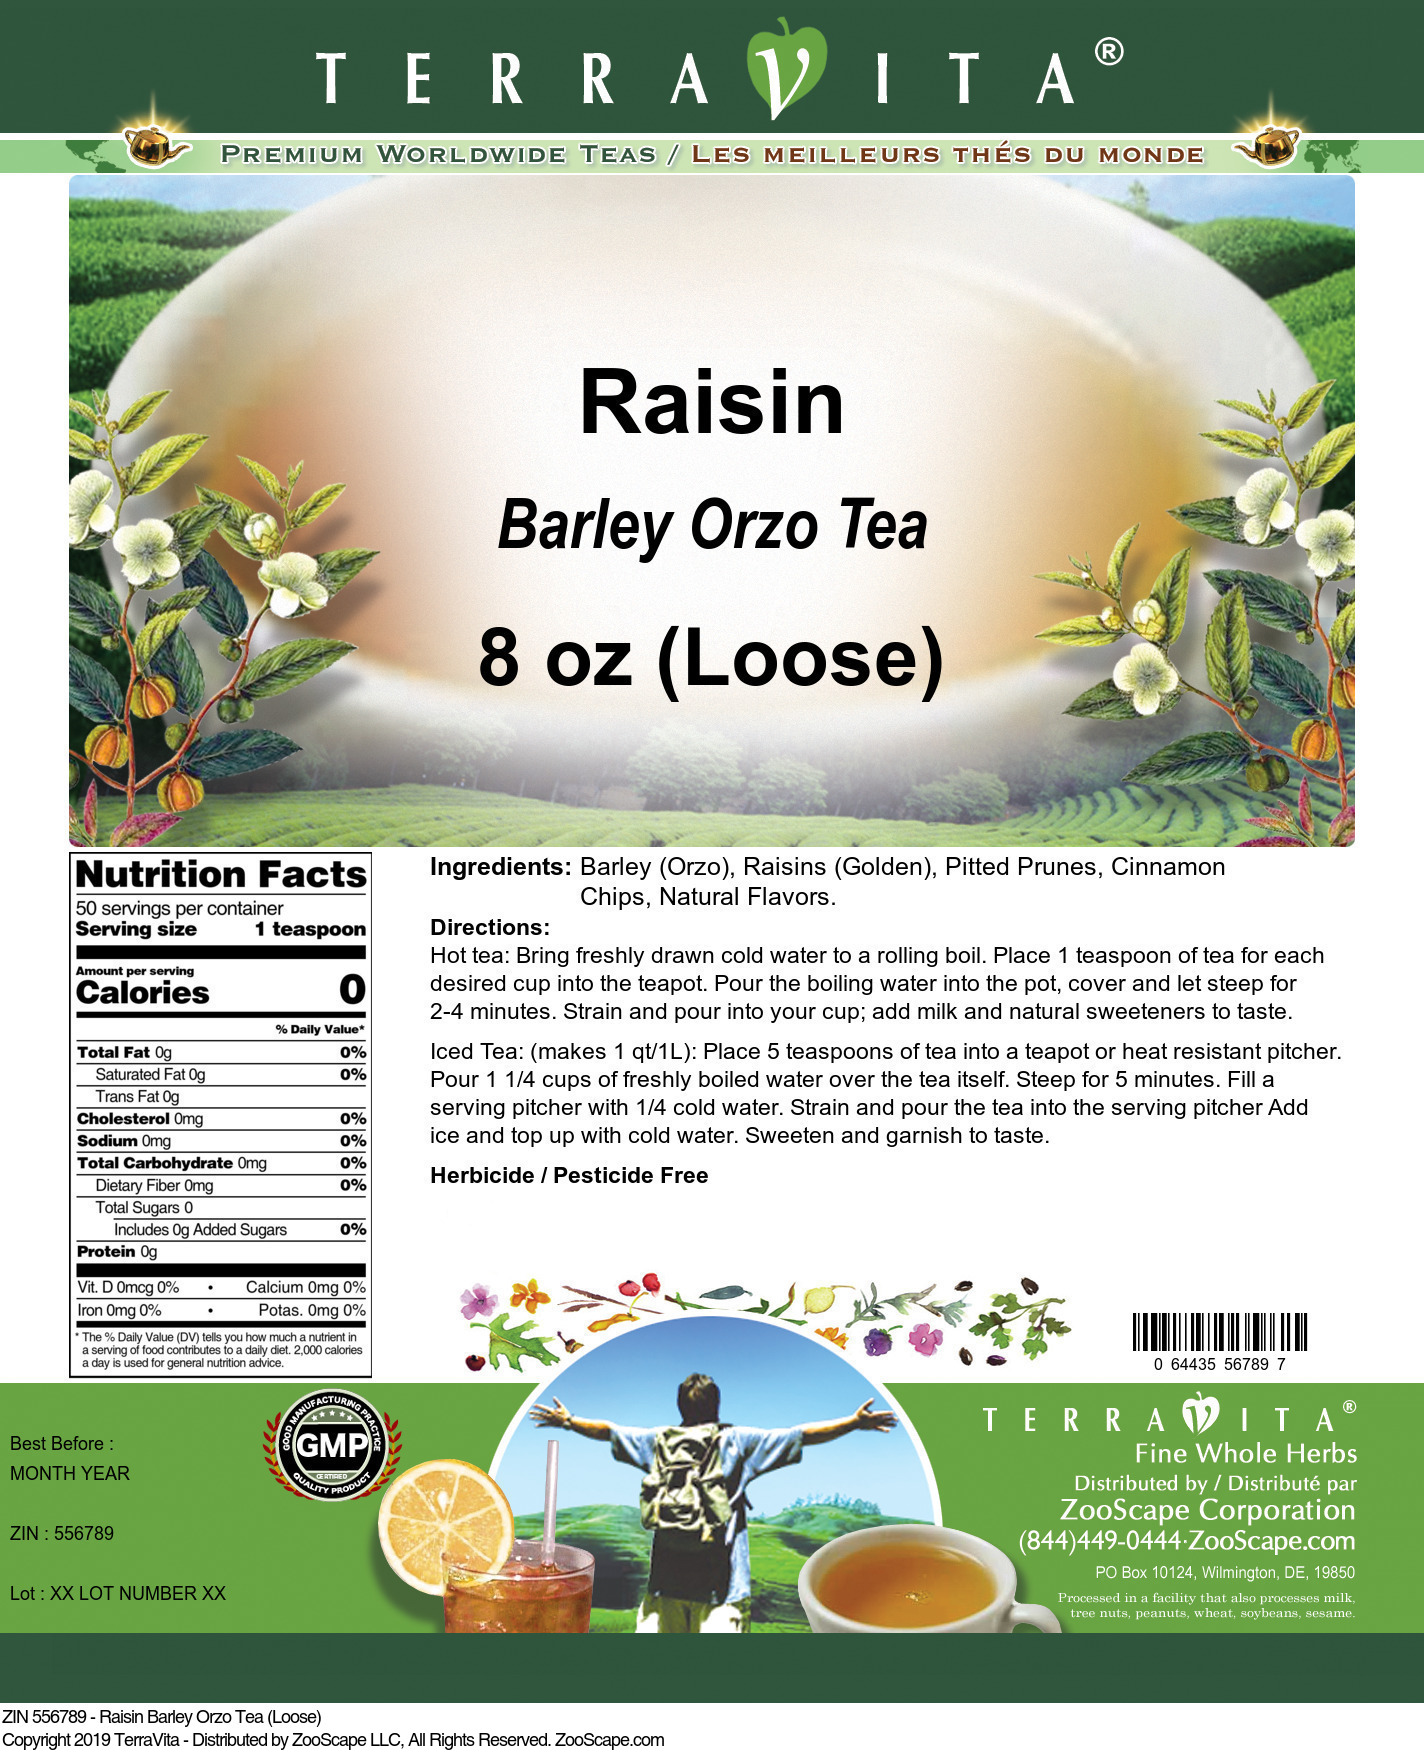 Raisin Barley Orzo Tea (Loose)